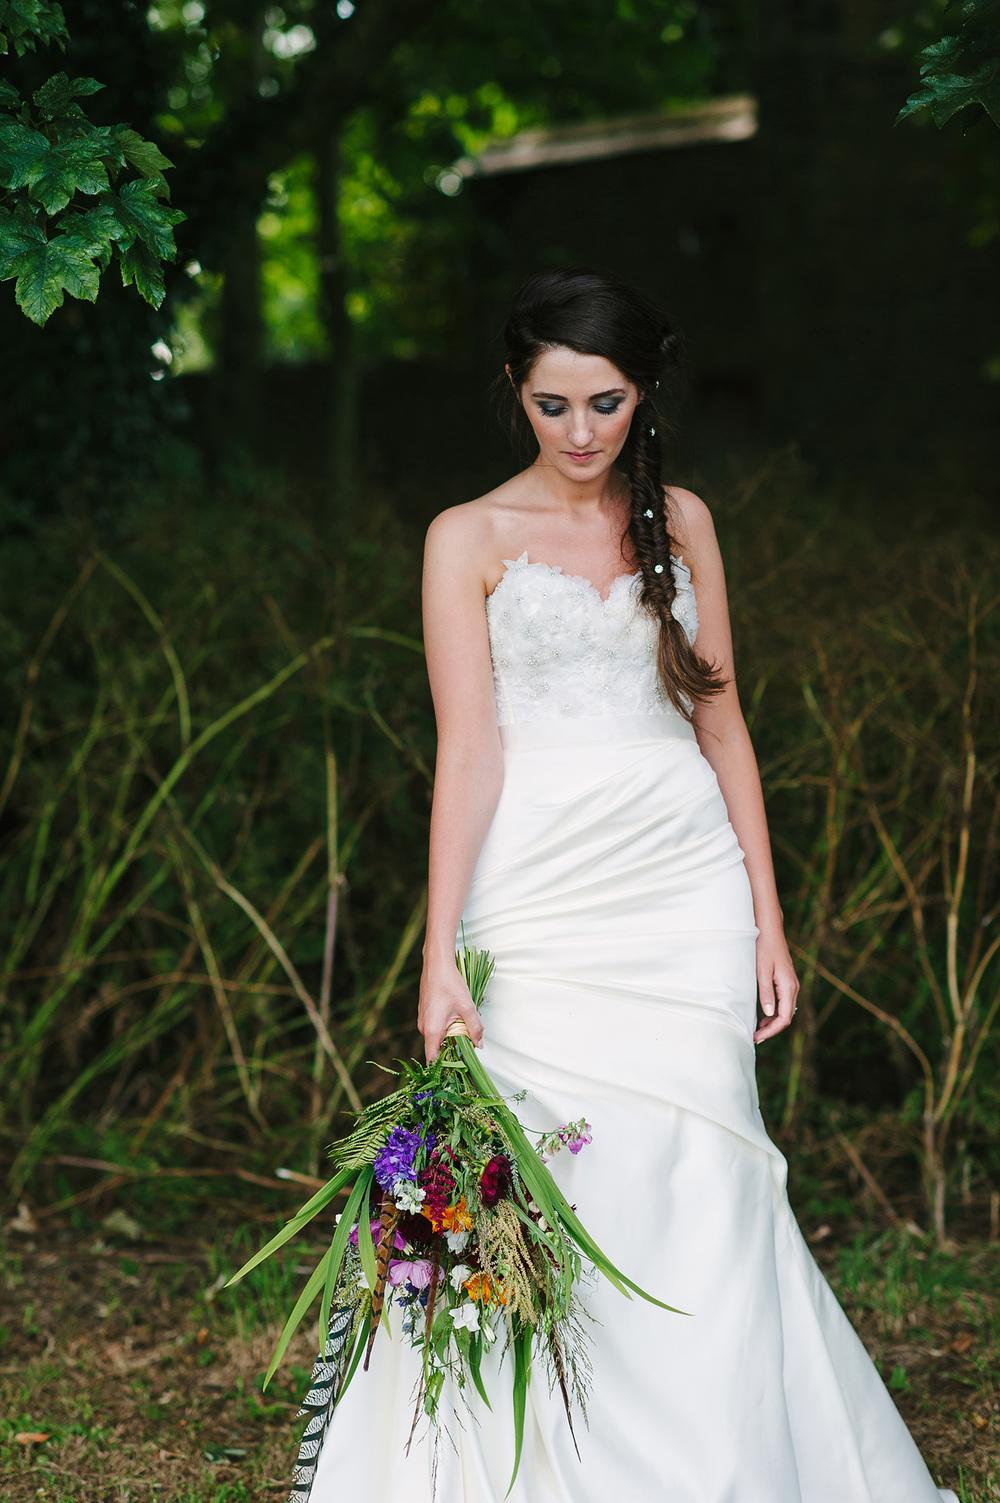 Irish Wedding Photographers Bellinter House Wedding Holly and Barry 111.JPG